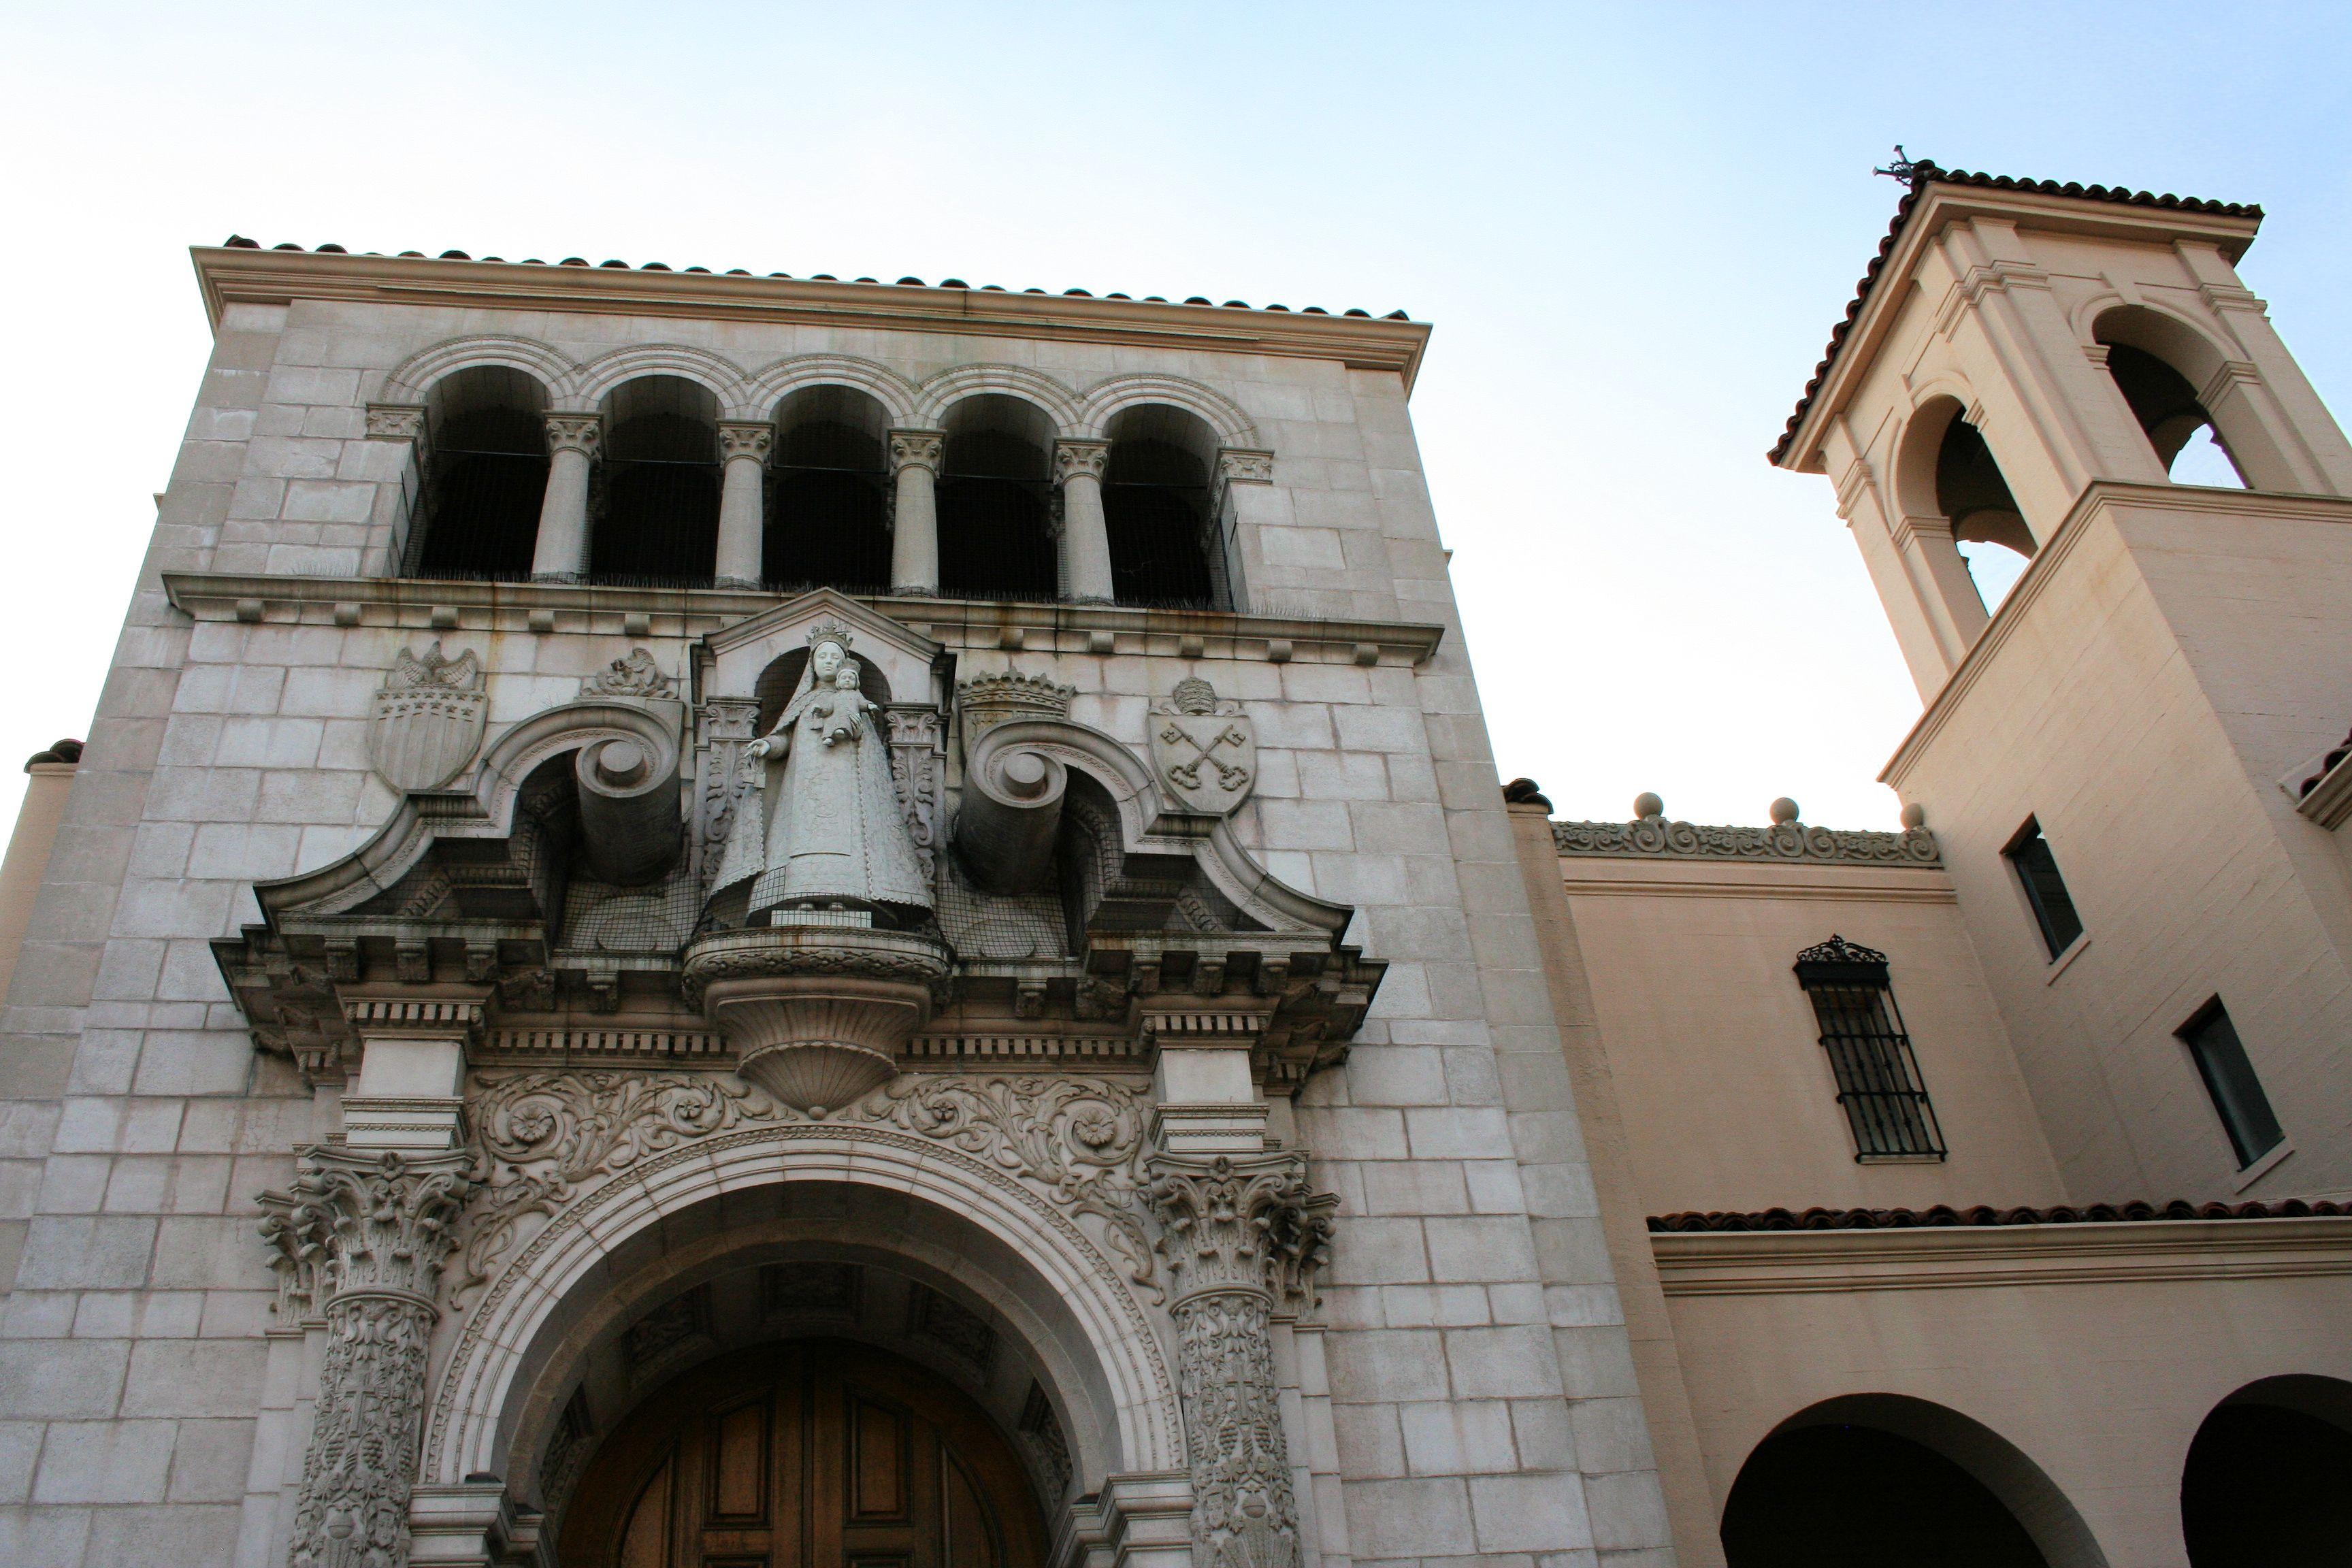 CMCR Chapel & Monastery